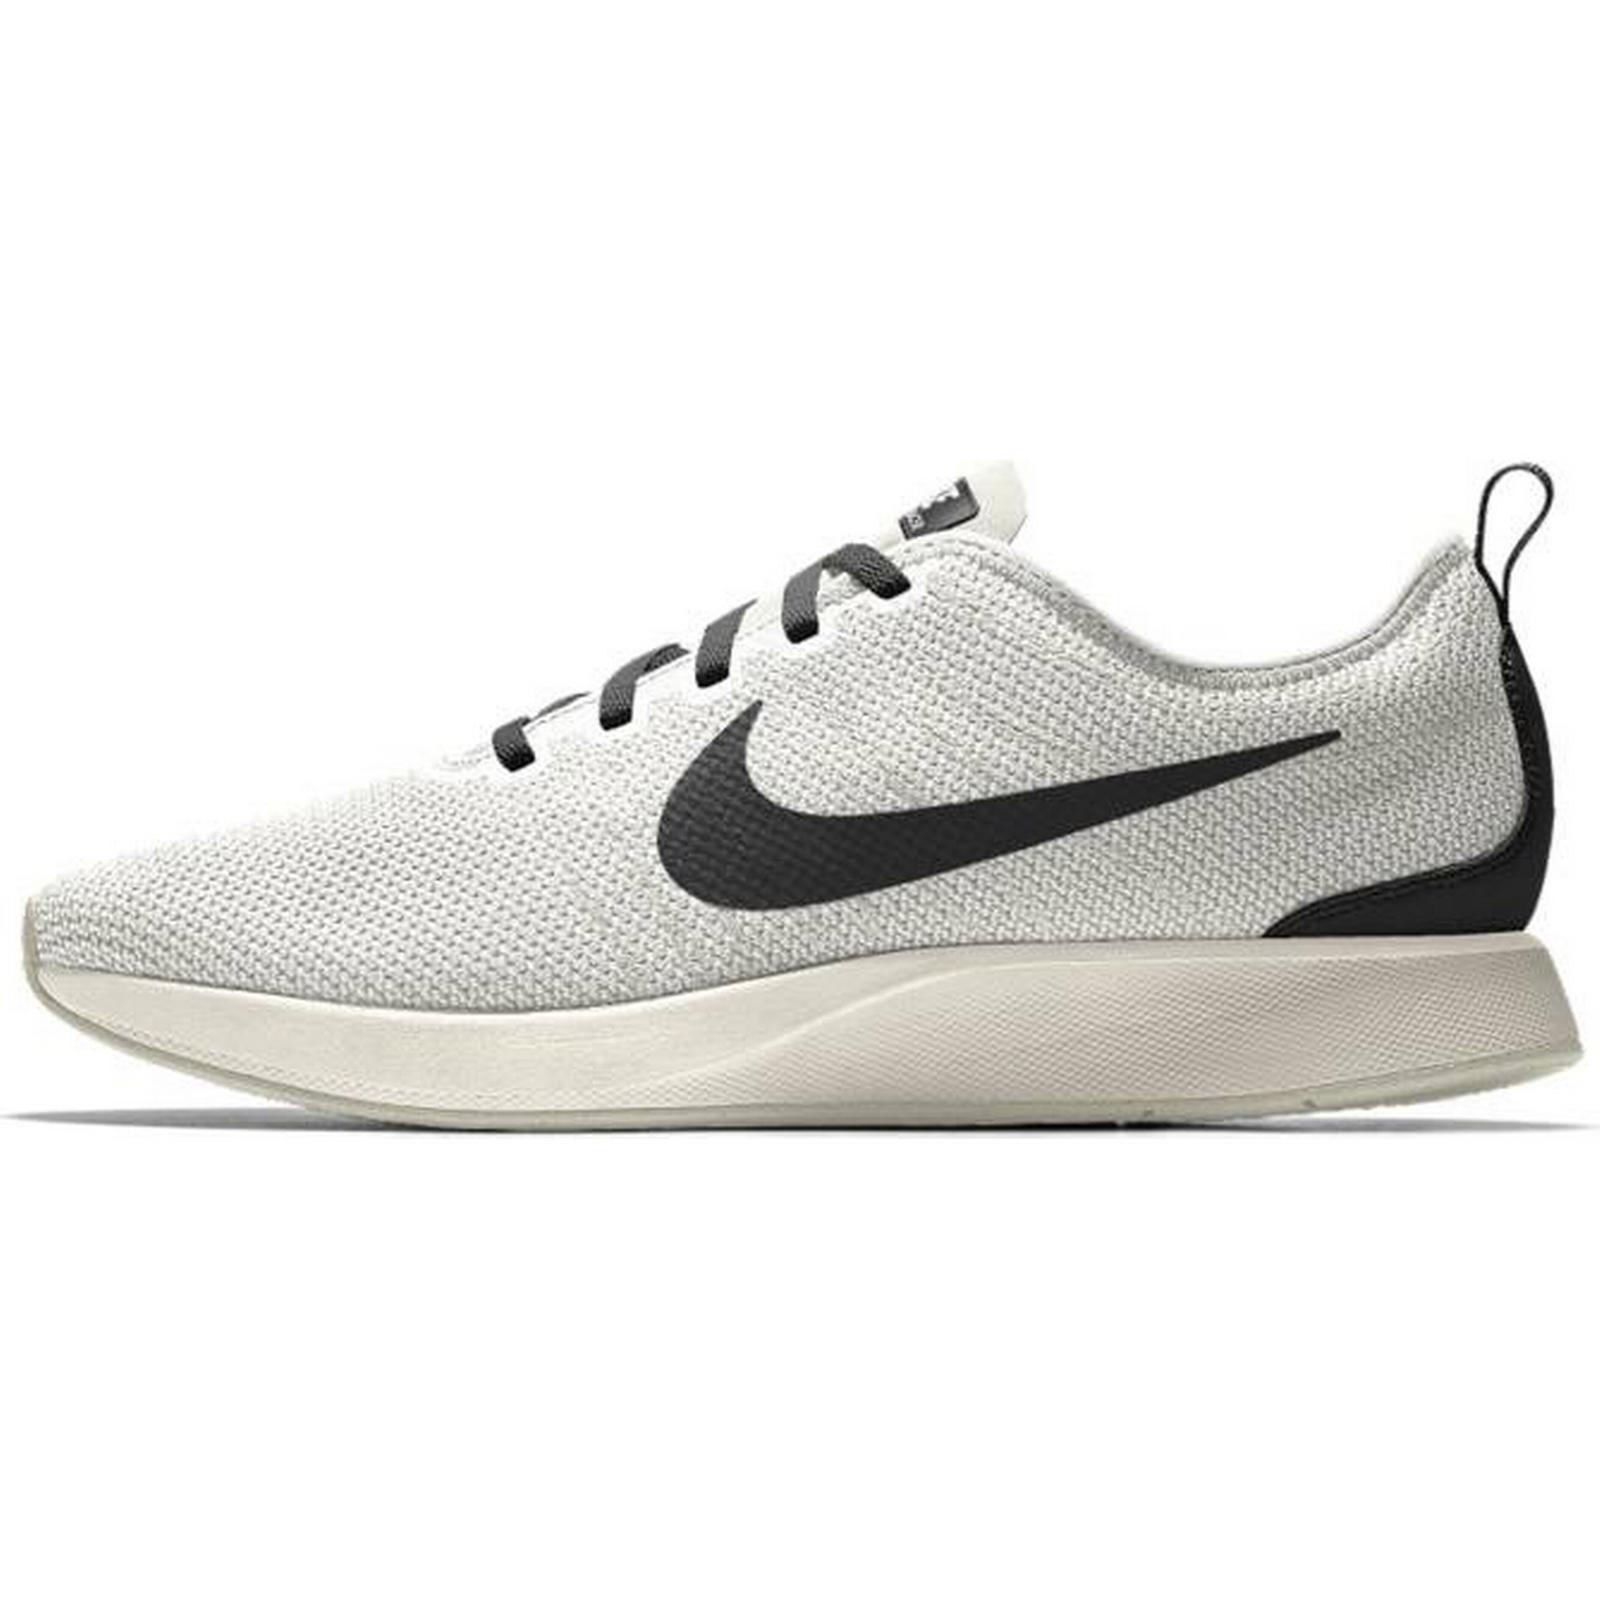 Man's/Woman's : NIKE Buty Męskie Nike Dualtone Quality Racer ID : High Quality Dualtone d91738